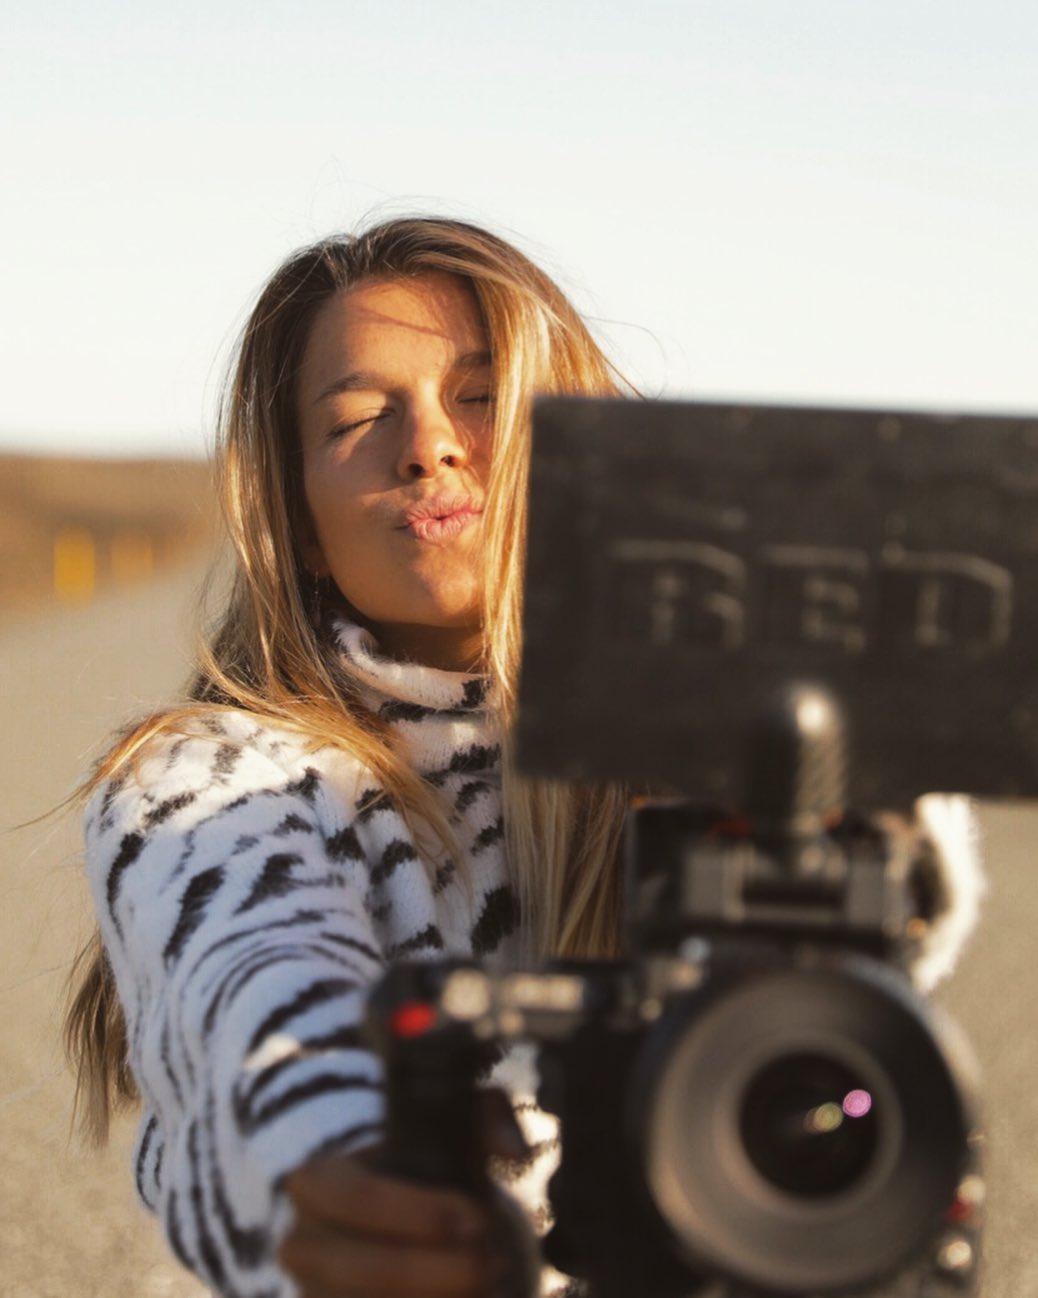 Lights, Camera, Action .... 🎥 Staytune Asfaraswecan2 - Travel